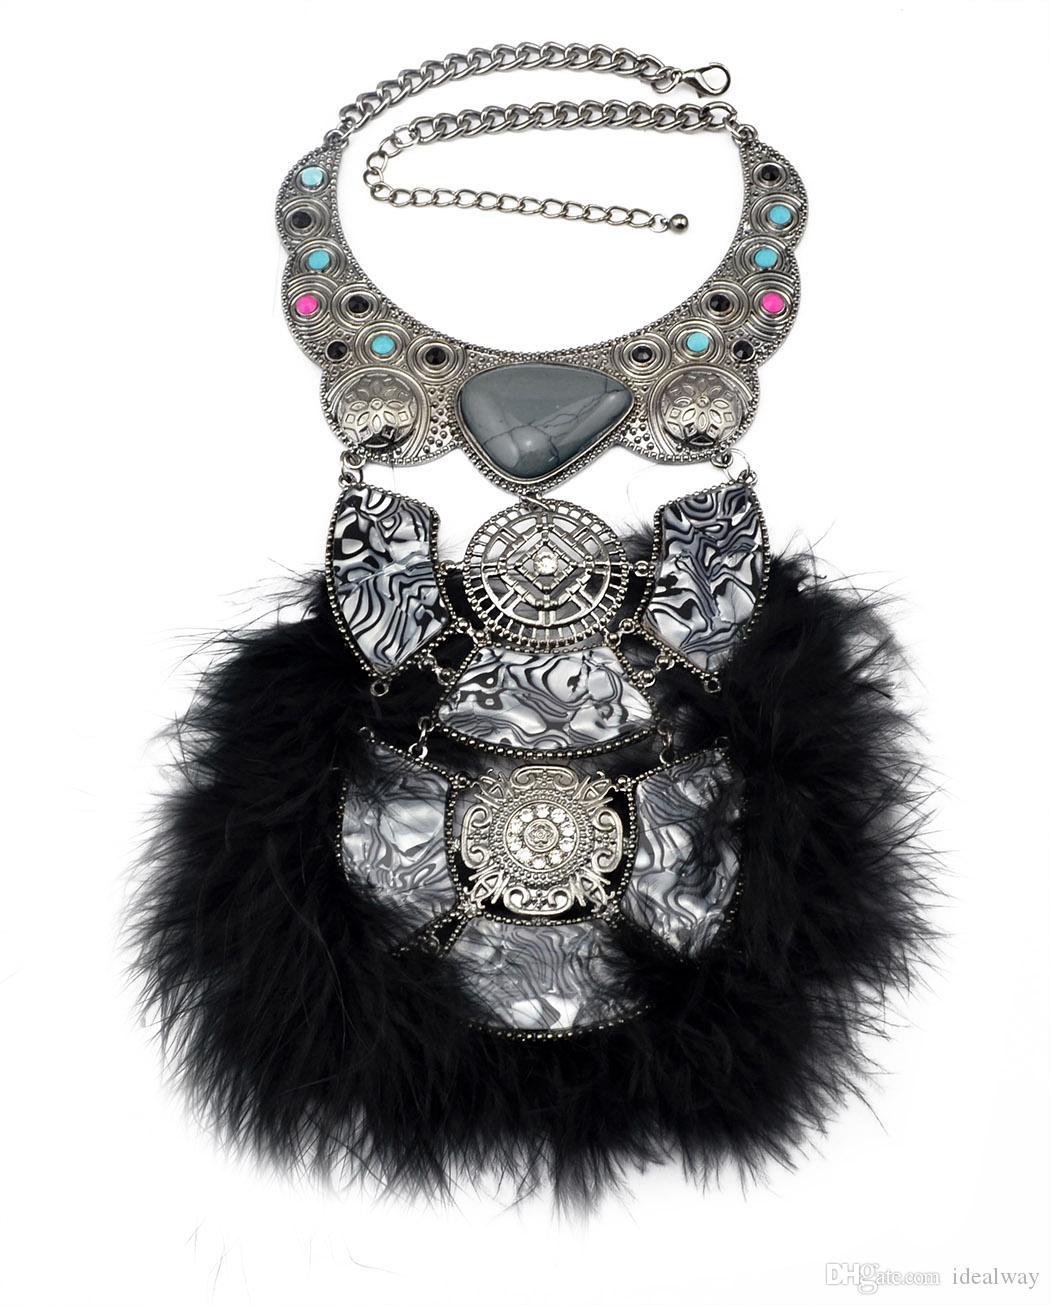 Idealway Mode ethnische Frauen edle Kristall Feder Anhänger Hohe Qualität Softglam Federketten Choker Aussage Halskette